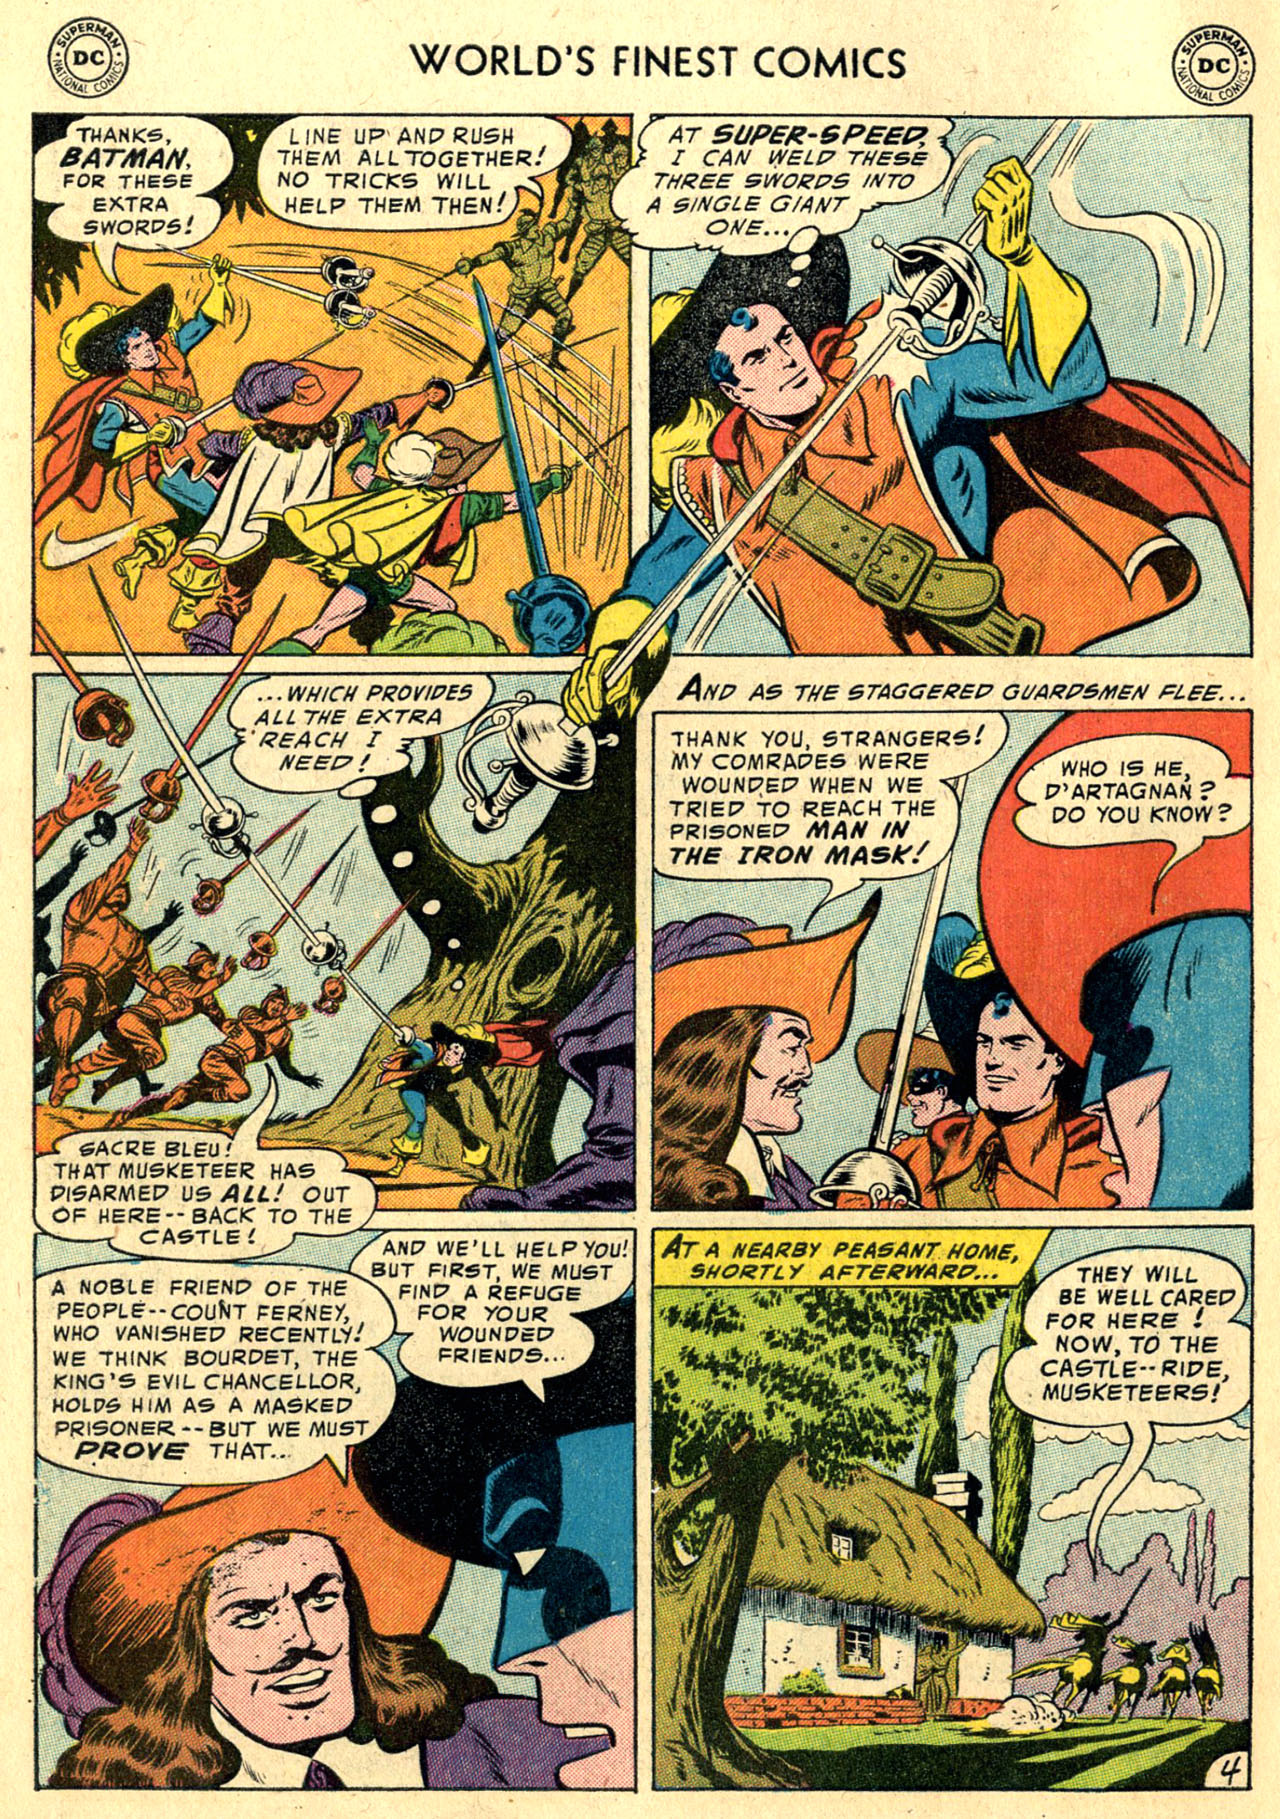 Read online World's Finest Comics comic -  Issue #82 - 6